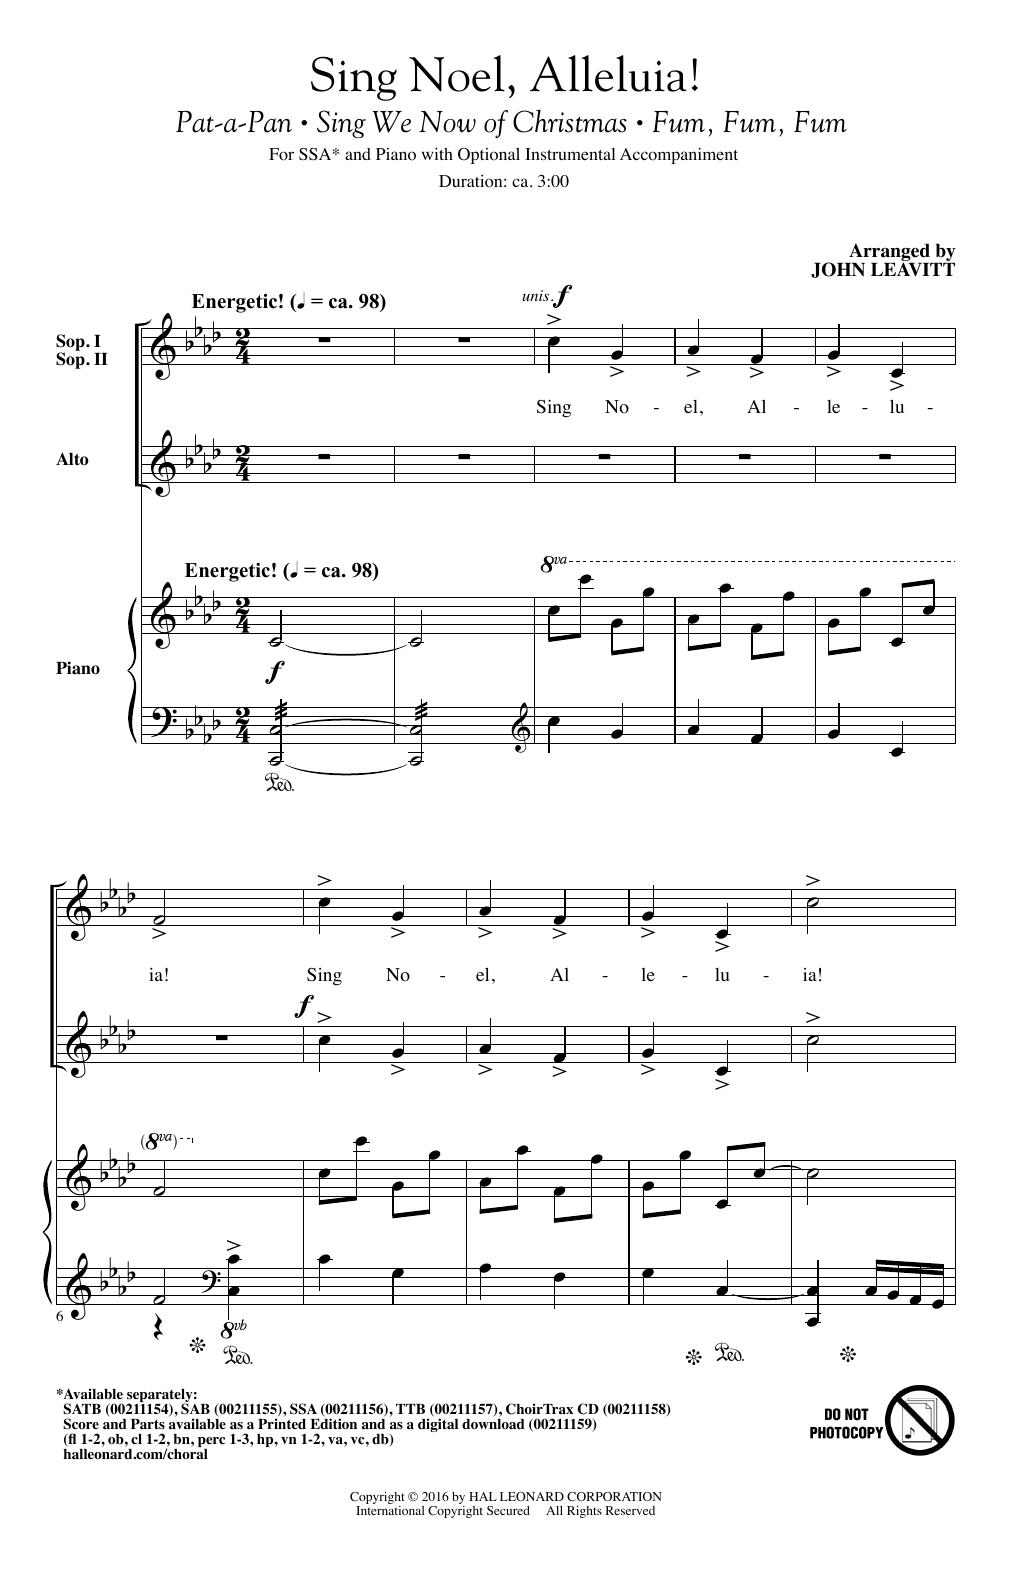 Sing Noel, Alleluia! (SSA Choir)